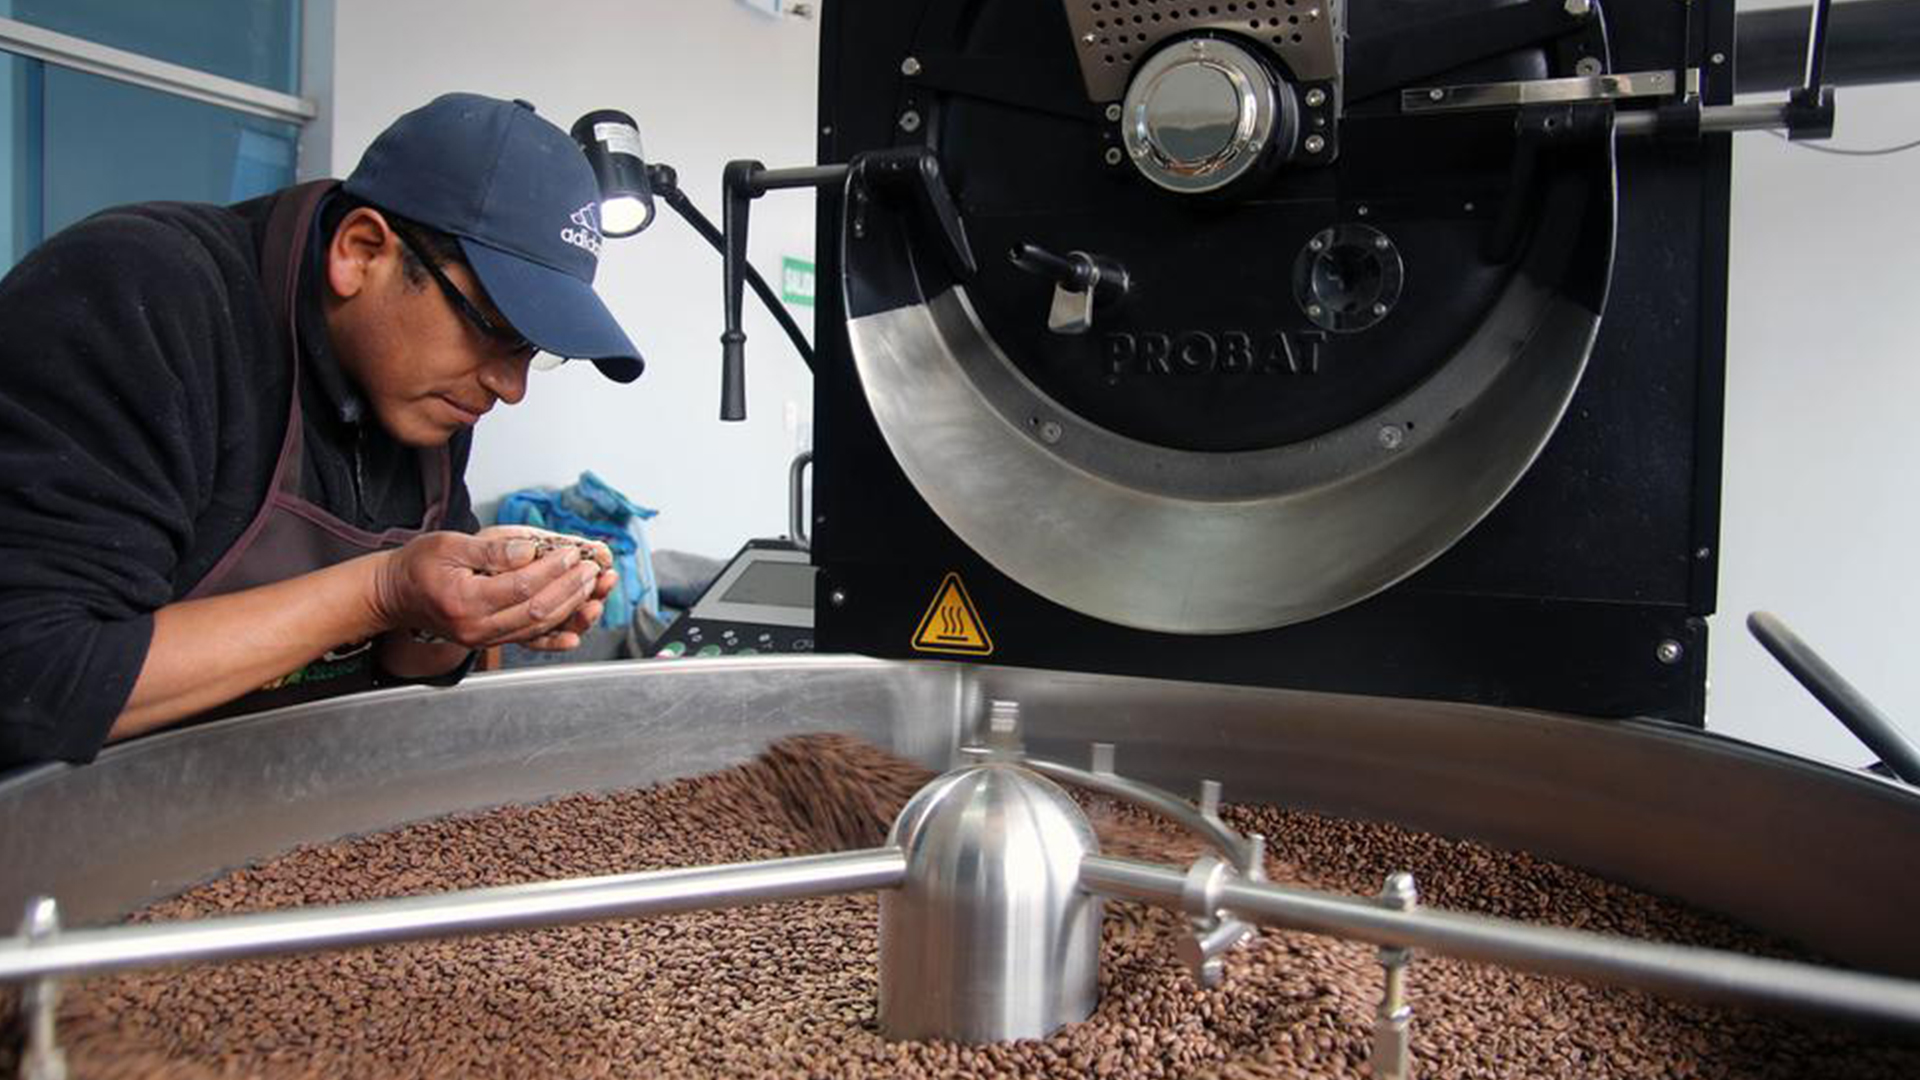 Planta procesadora de café